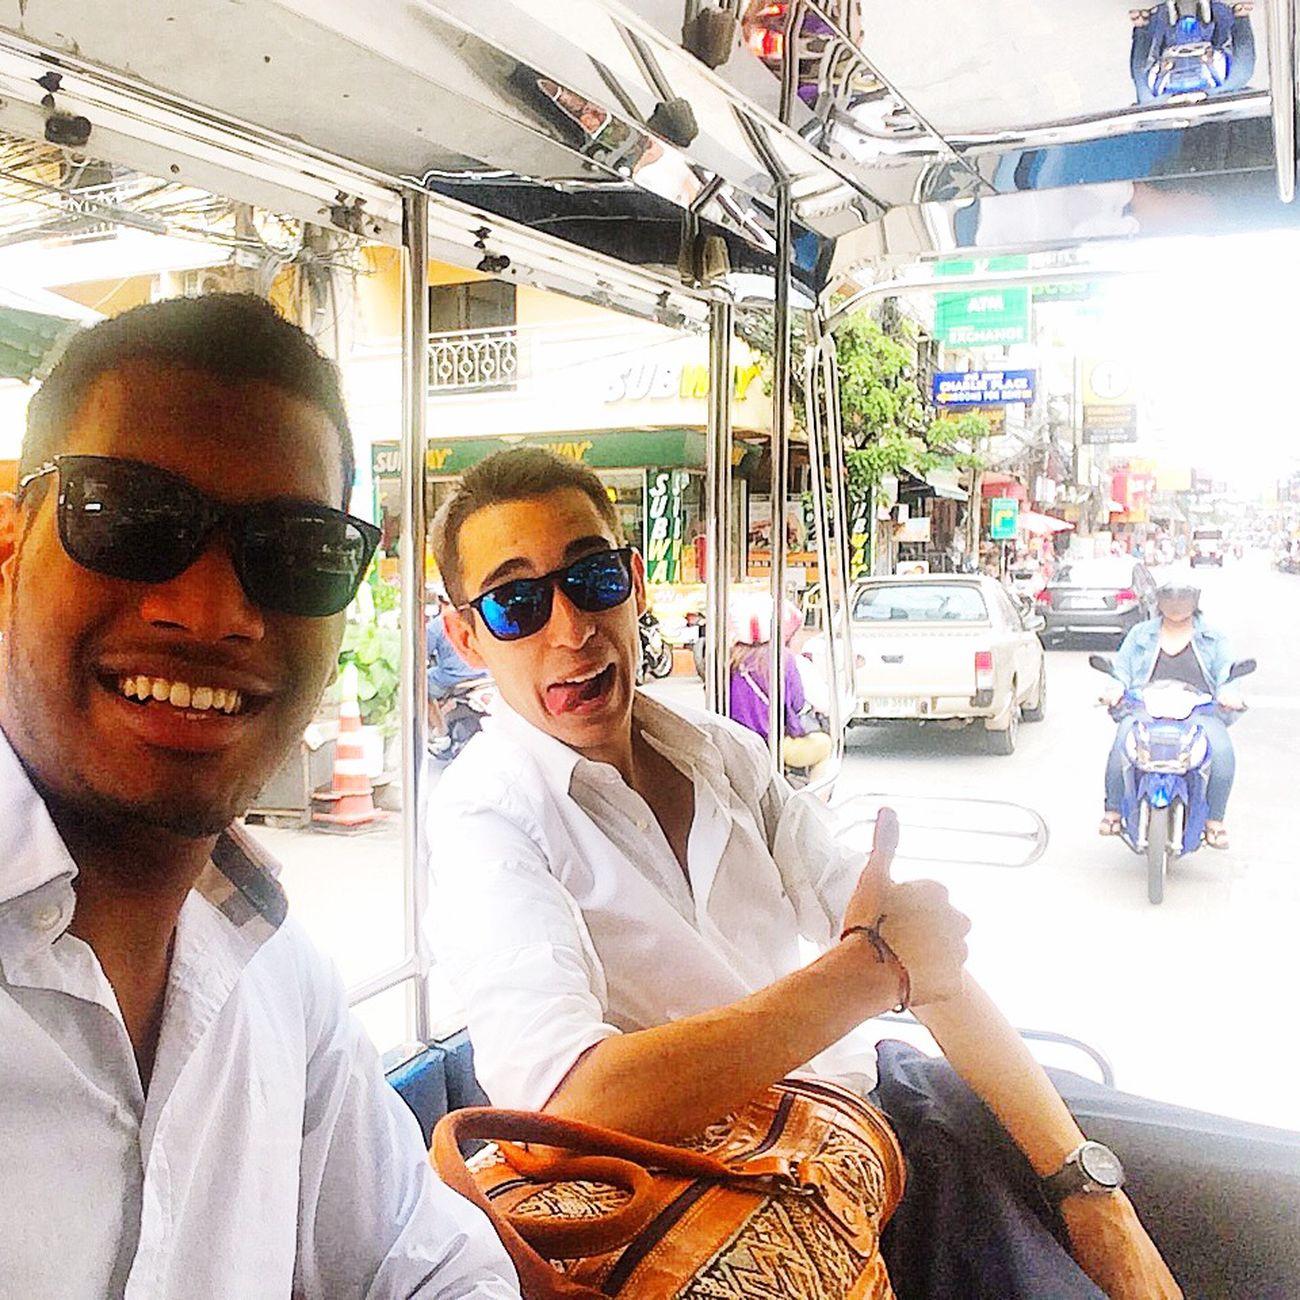 Dans le taxi pick-up en Thailande !! Thaïlande Brother Holidays